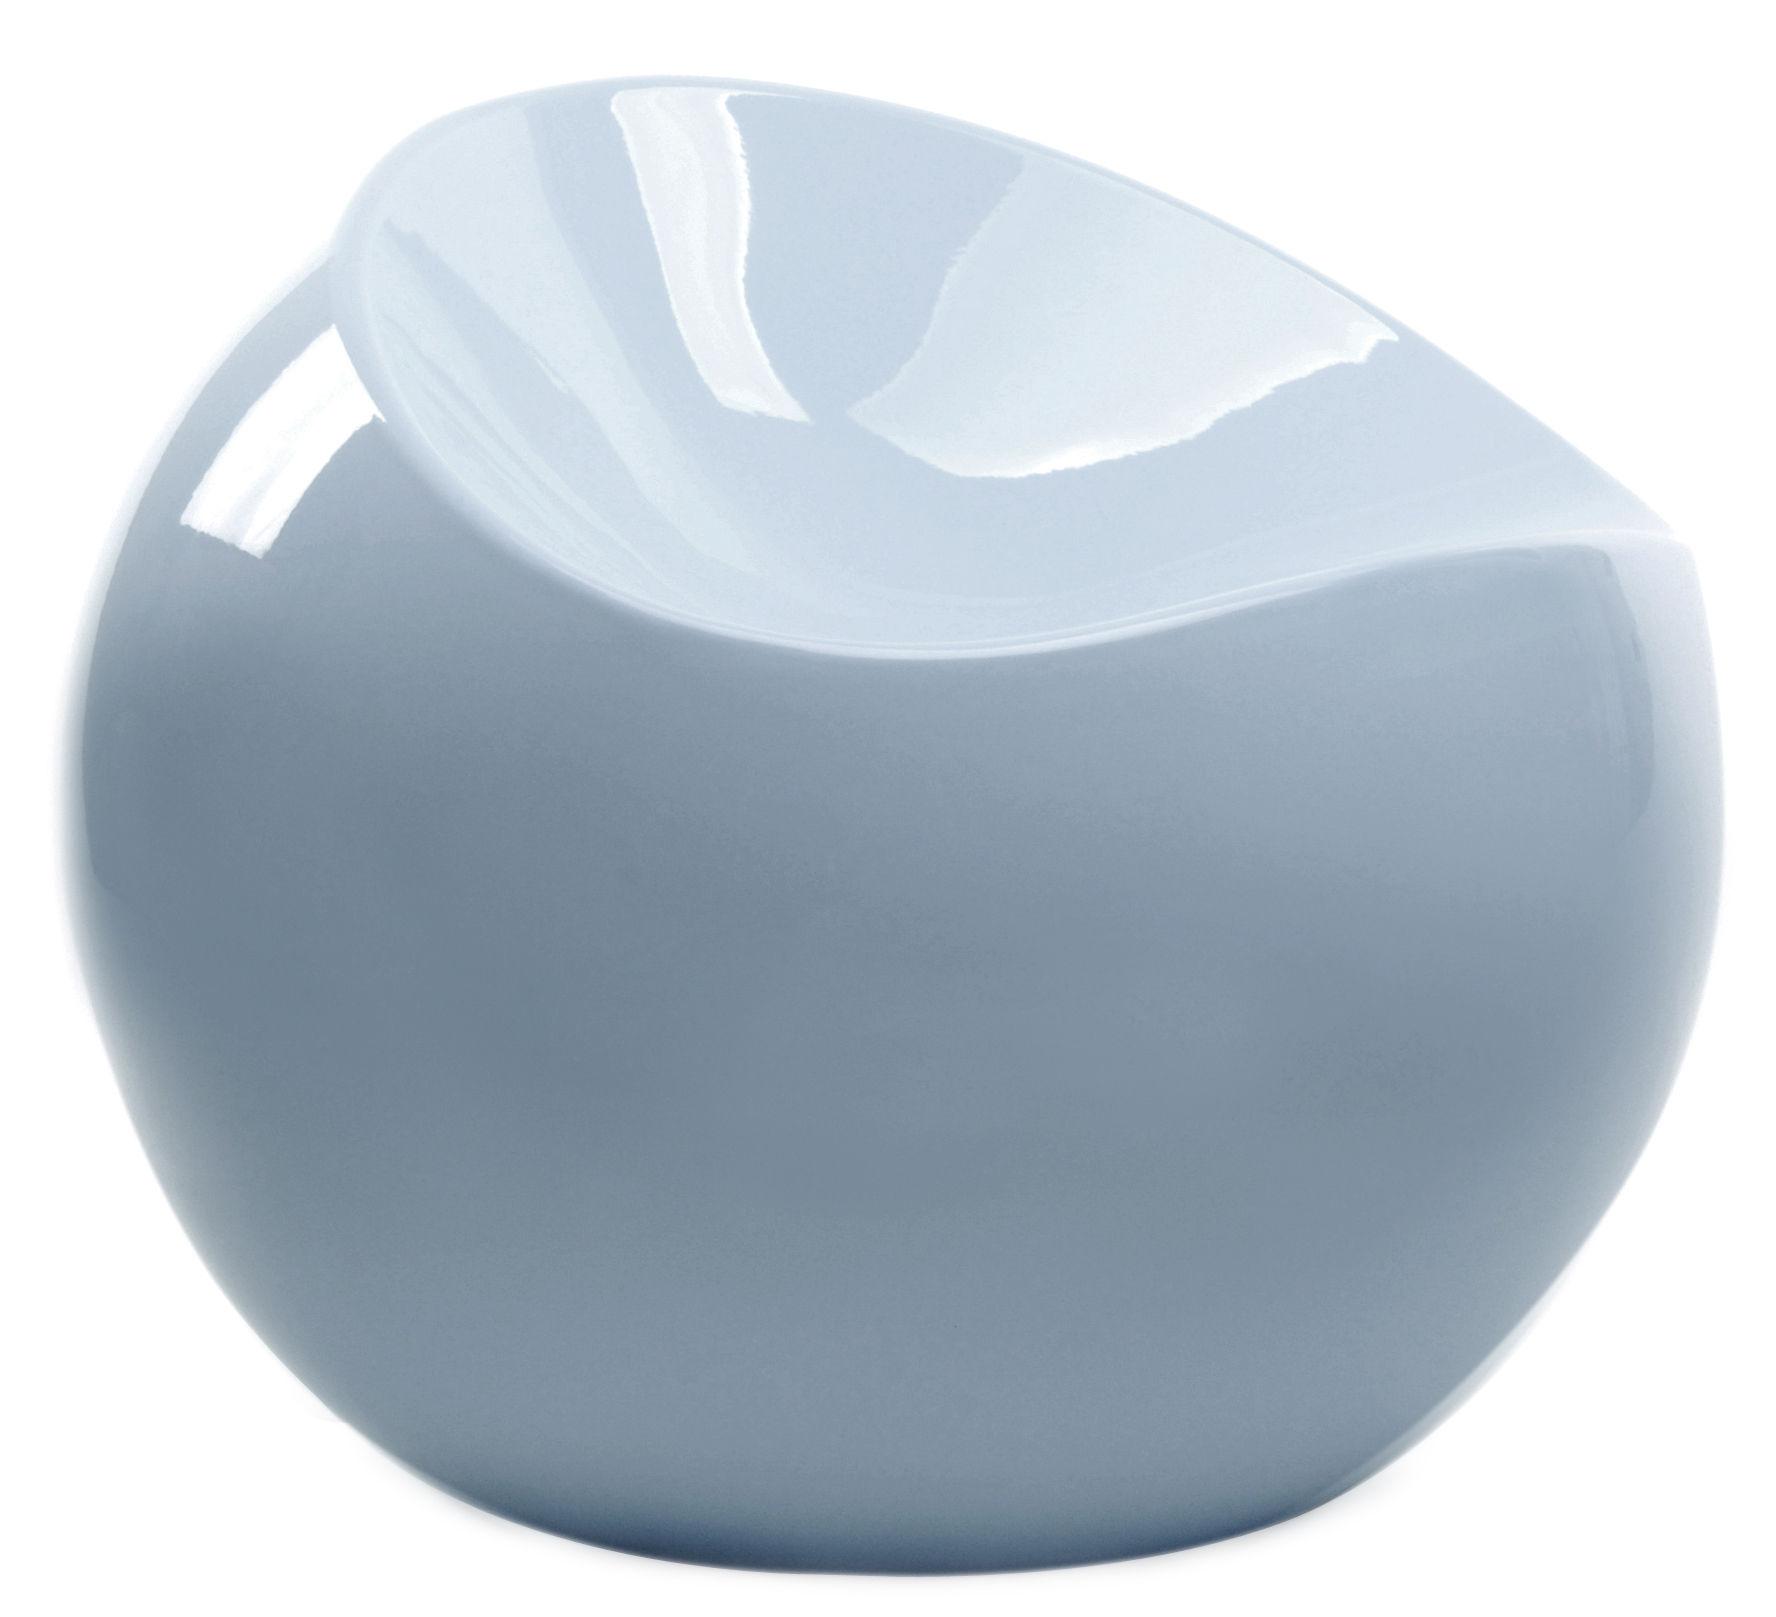 pouf ball chair gris temp te xl boom. Black Bedroom Furniture Sets. Home Design Ideas